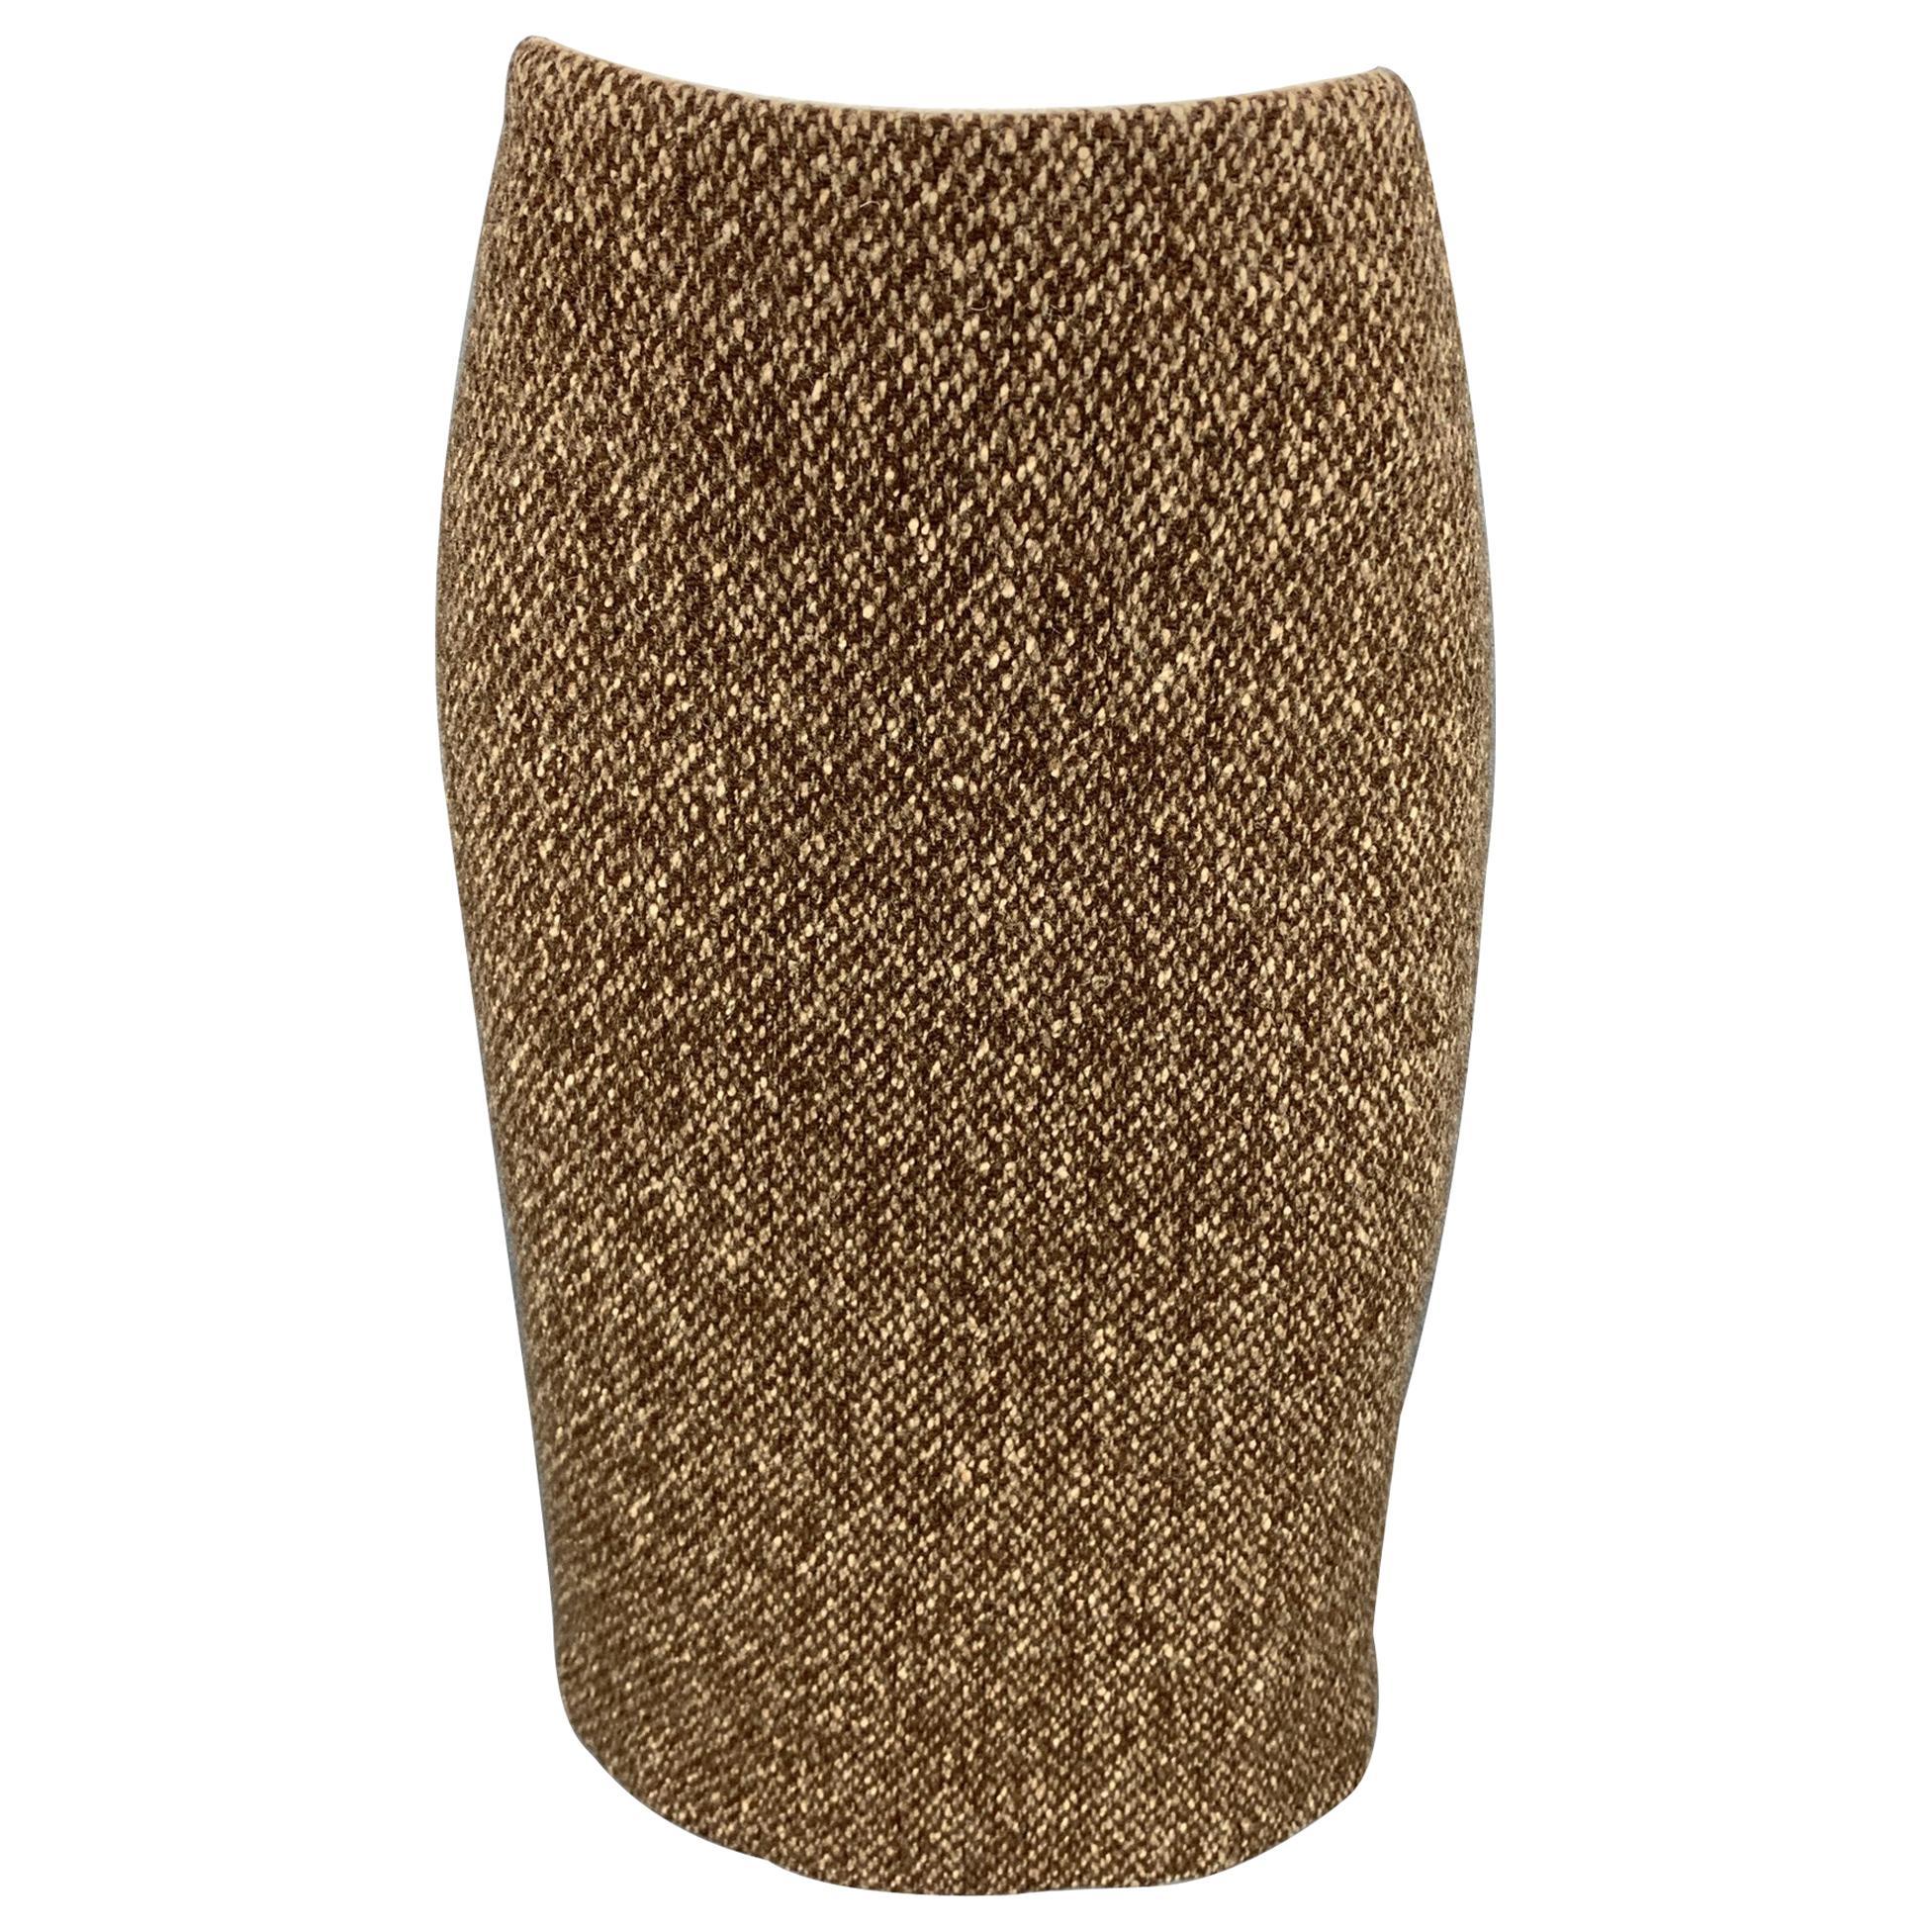 RALPH LAUREN Purple Label Size 4 Brown Tweed Wool / Cashmere A-Line Skirt